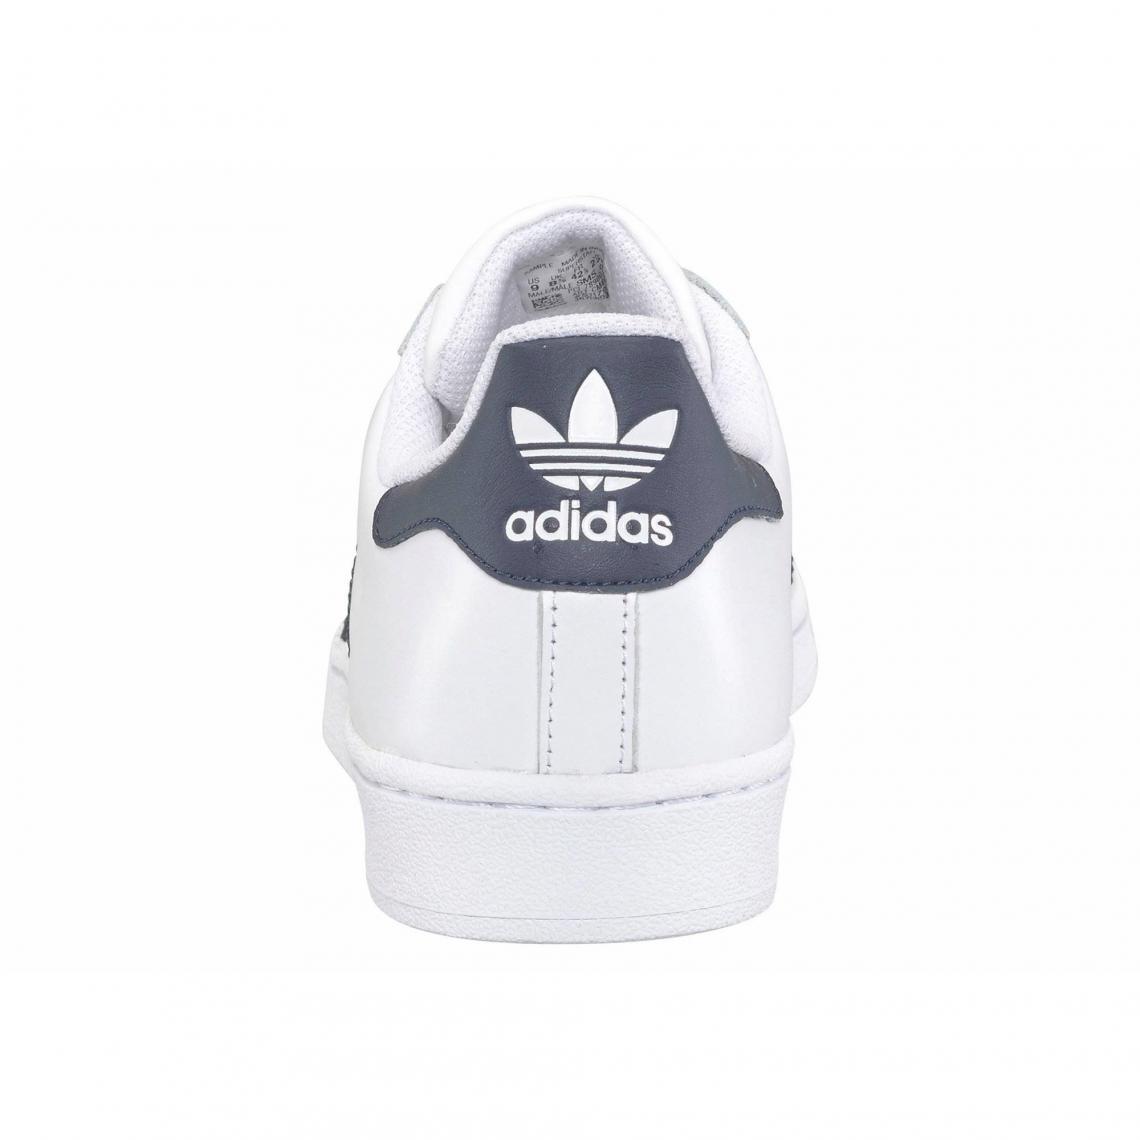 Superstar 14 Originals Avis homme Bleu Tennis adidas East River pour Yyvbf76gI